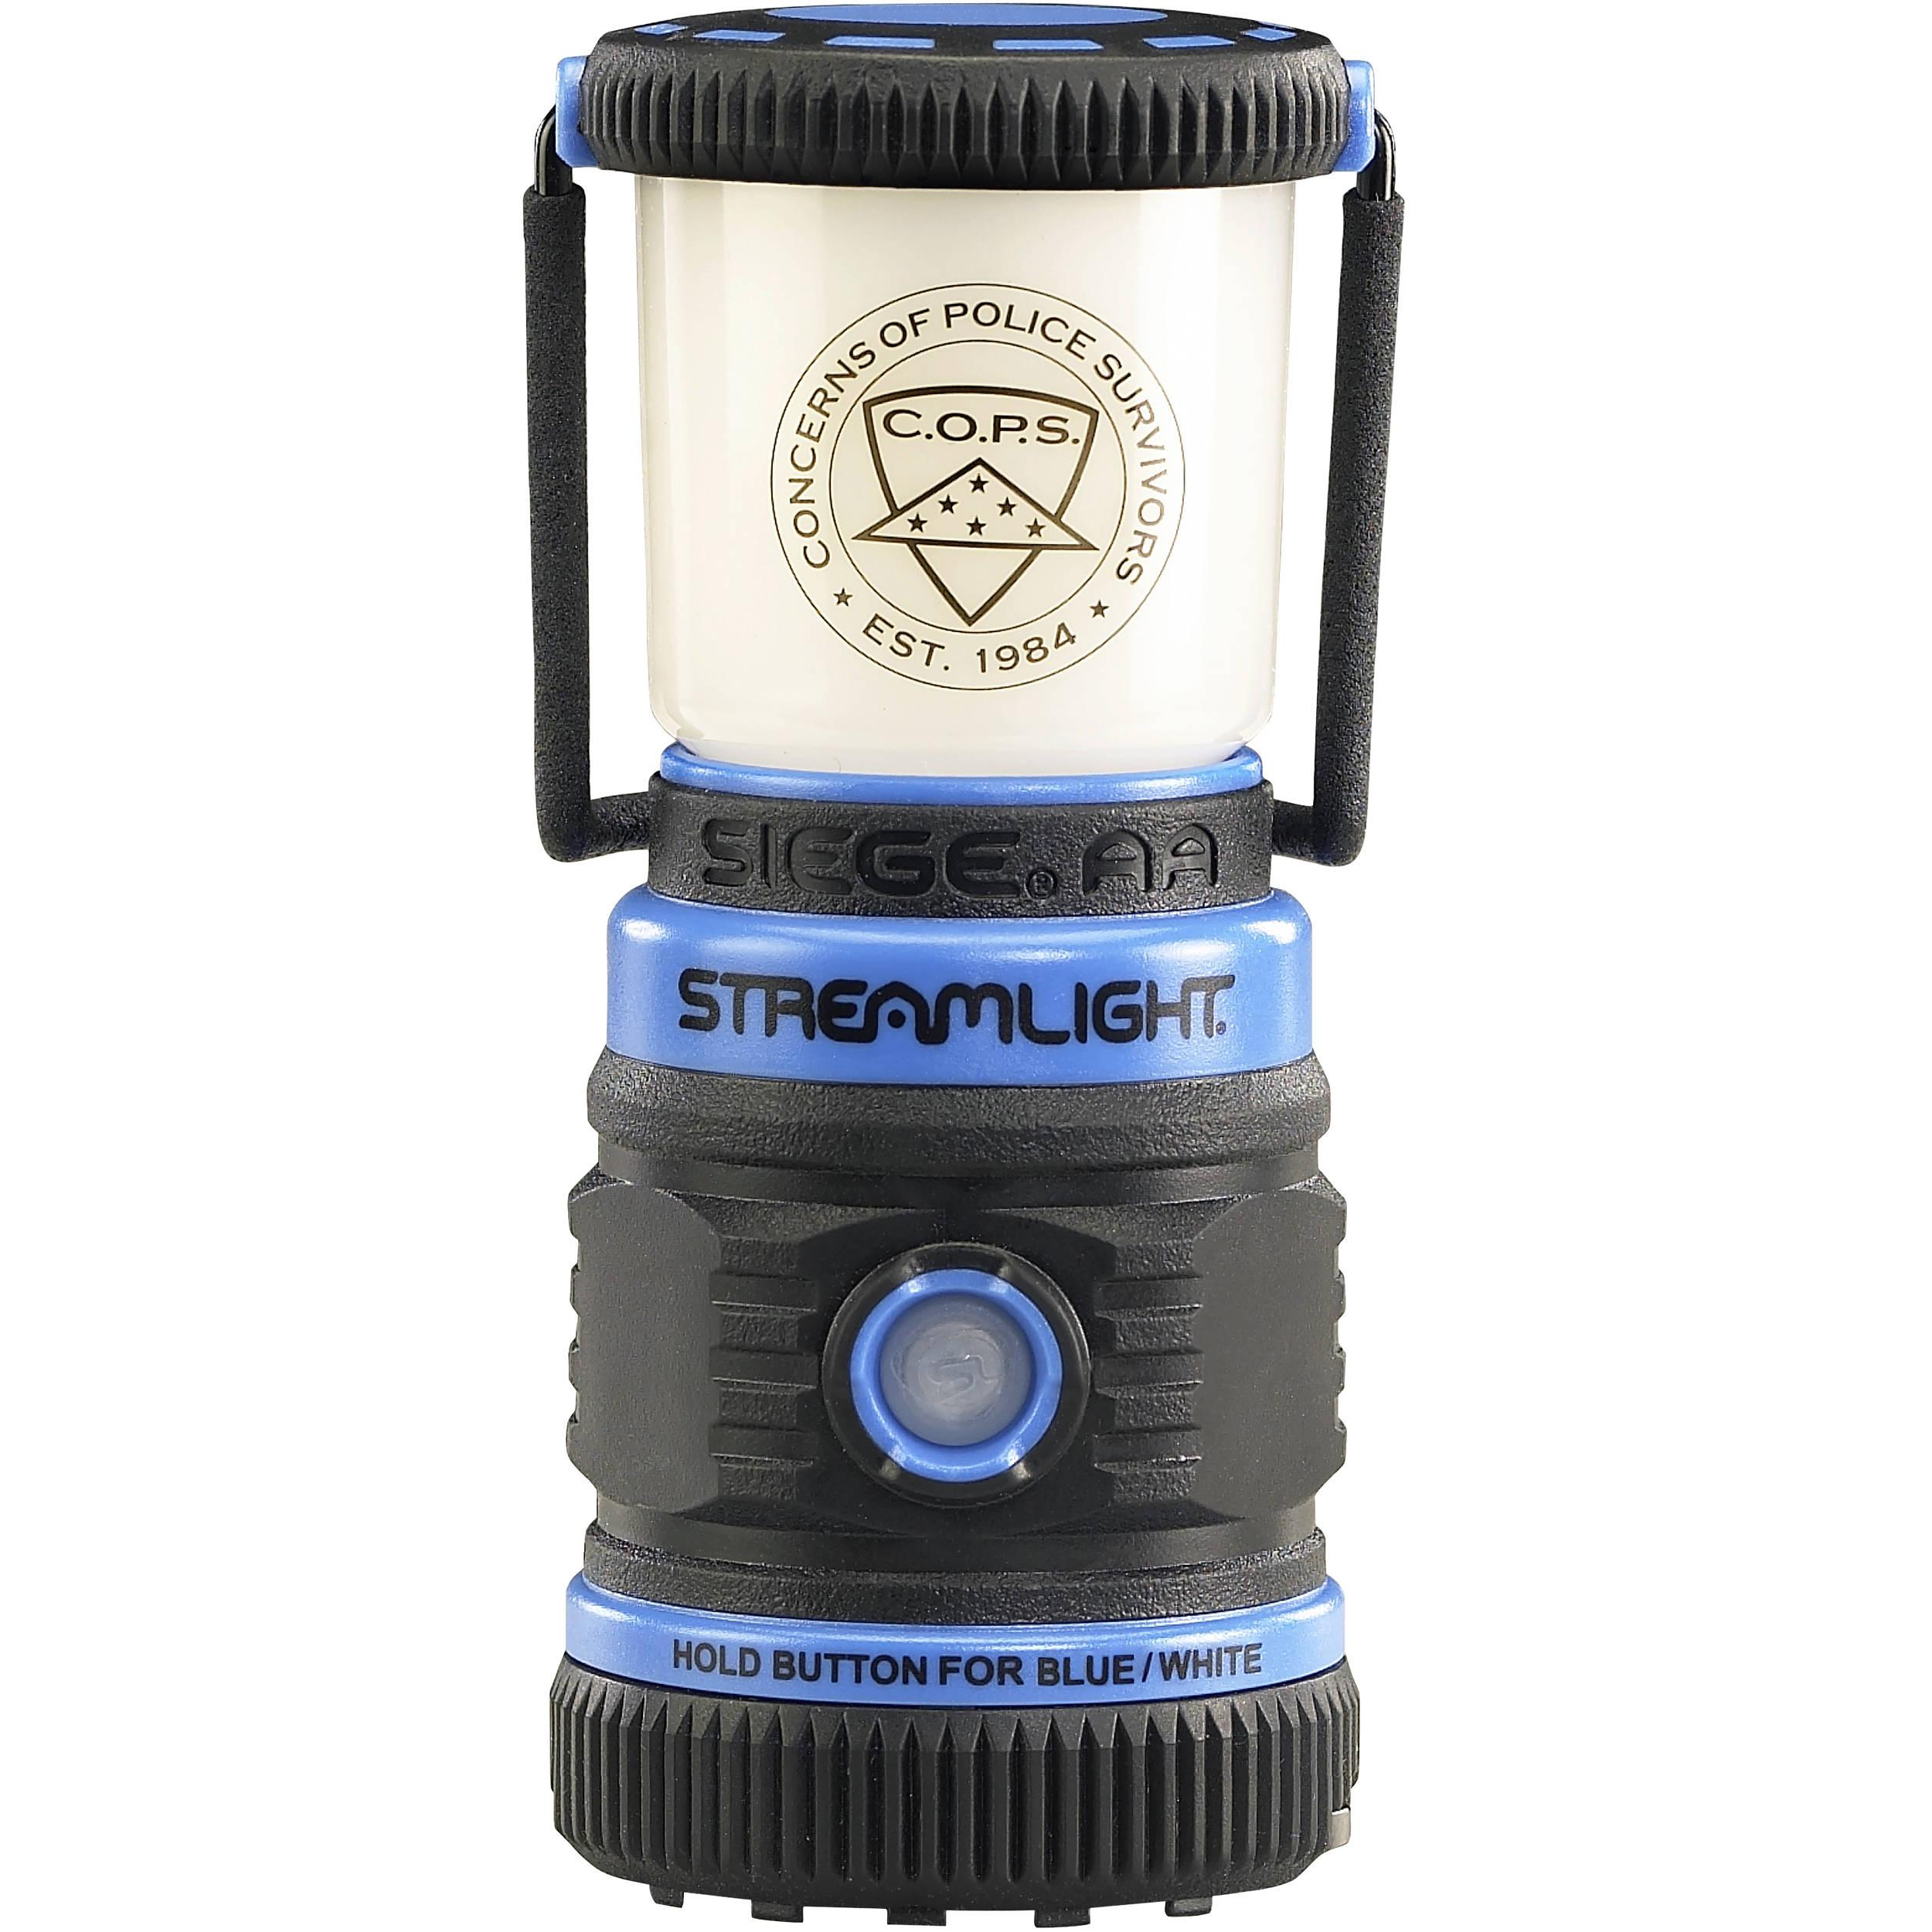 200 Lumen Streamlight 44941 Seige LED Lantern AA-Battery